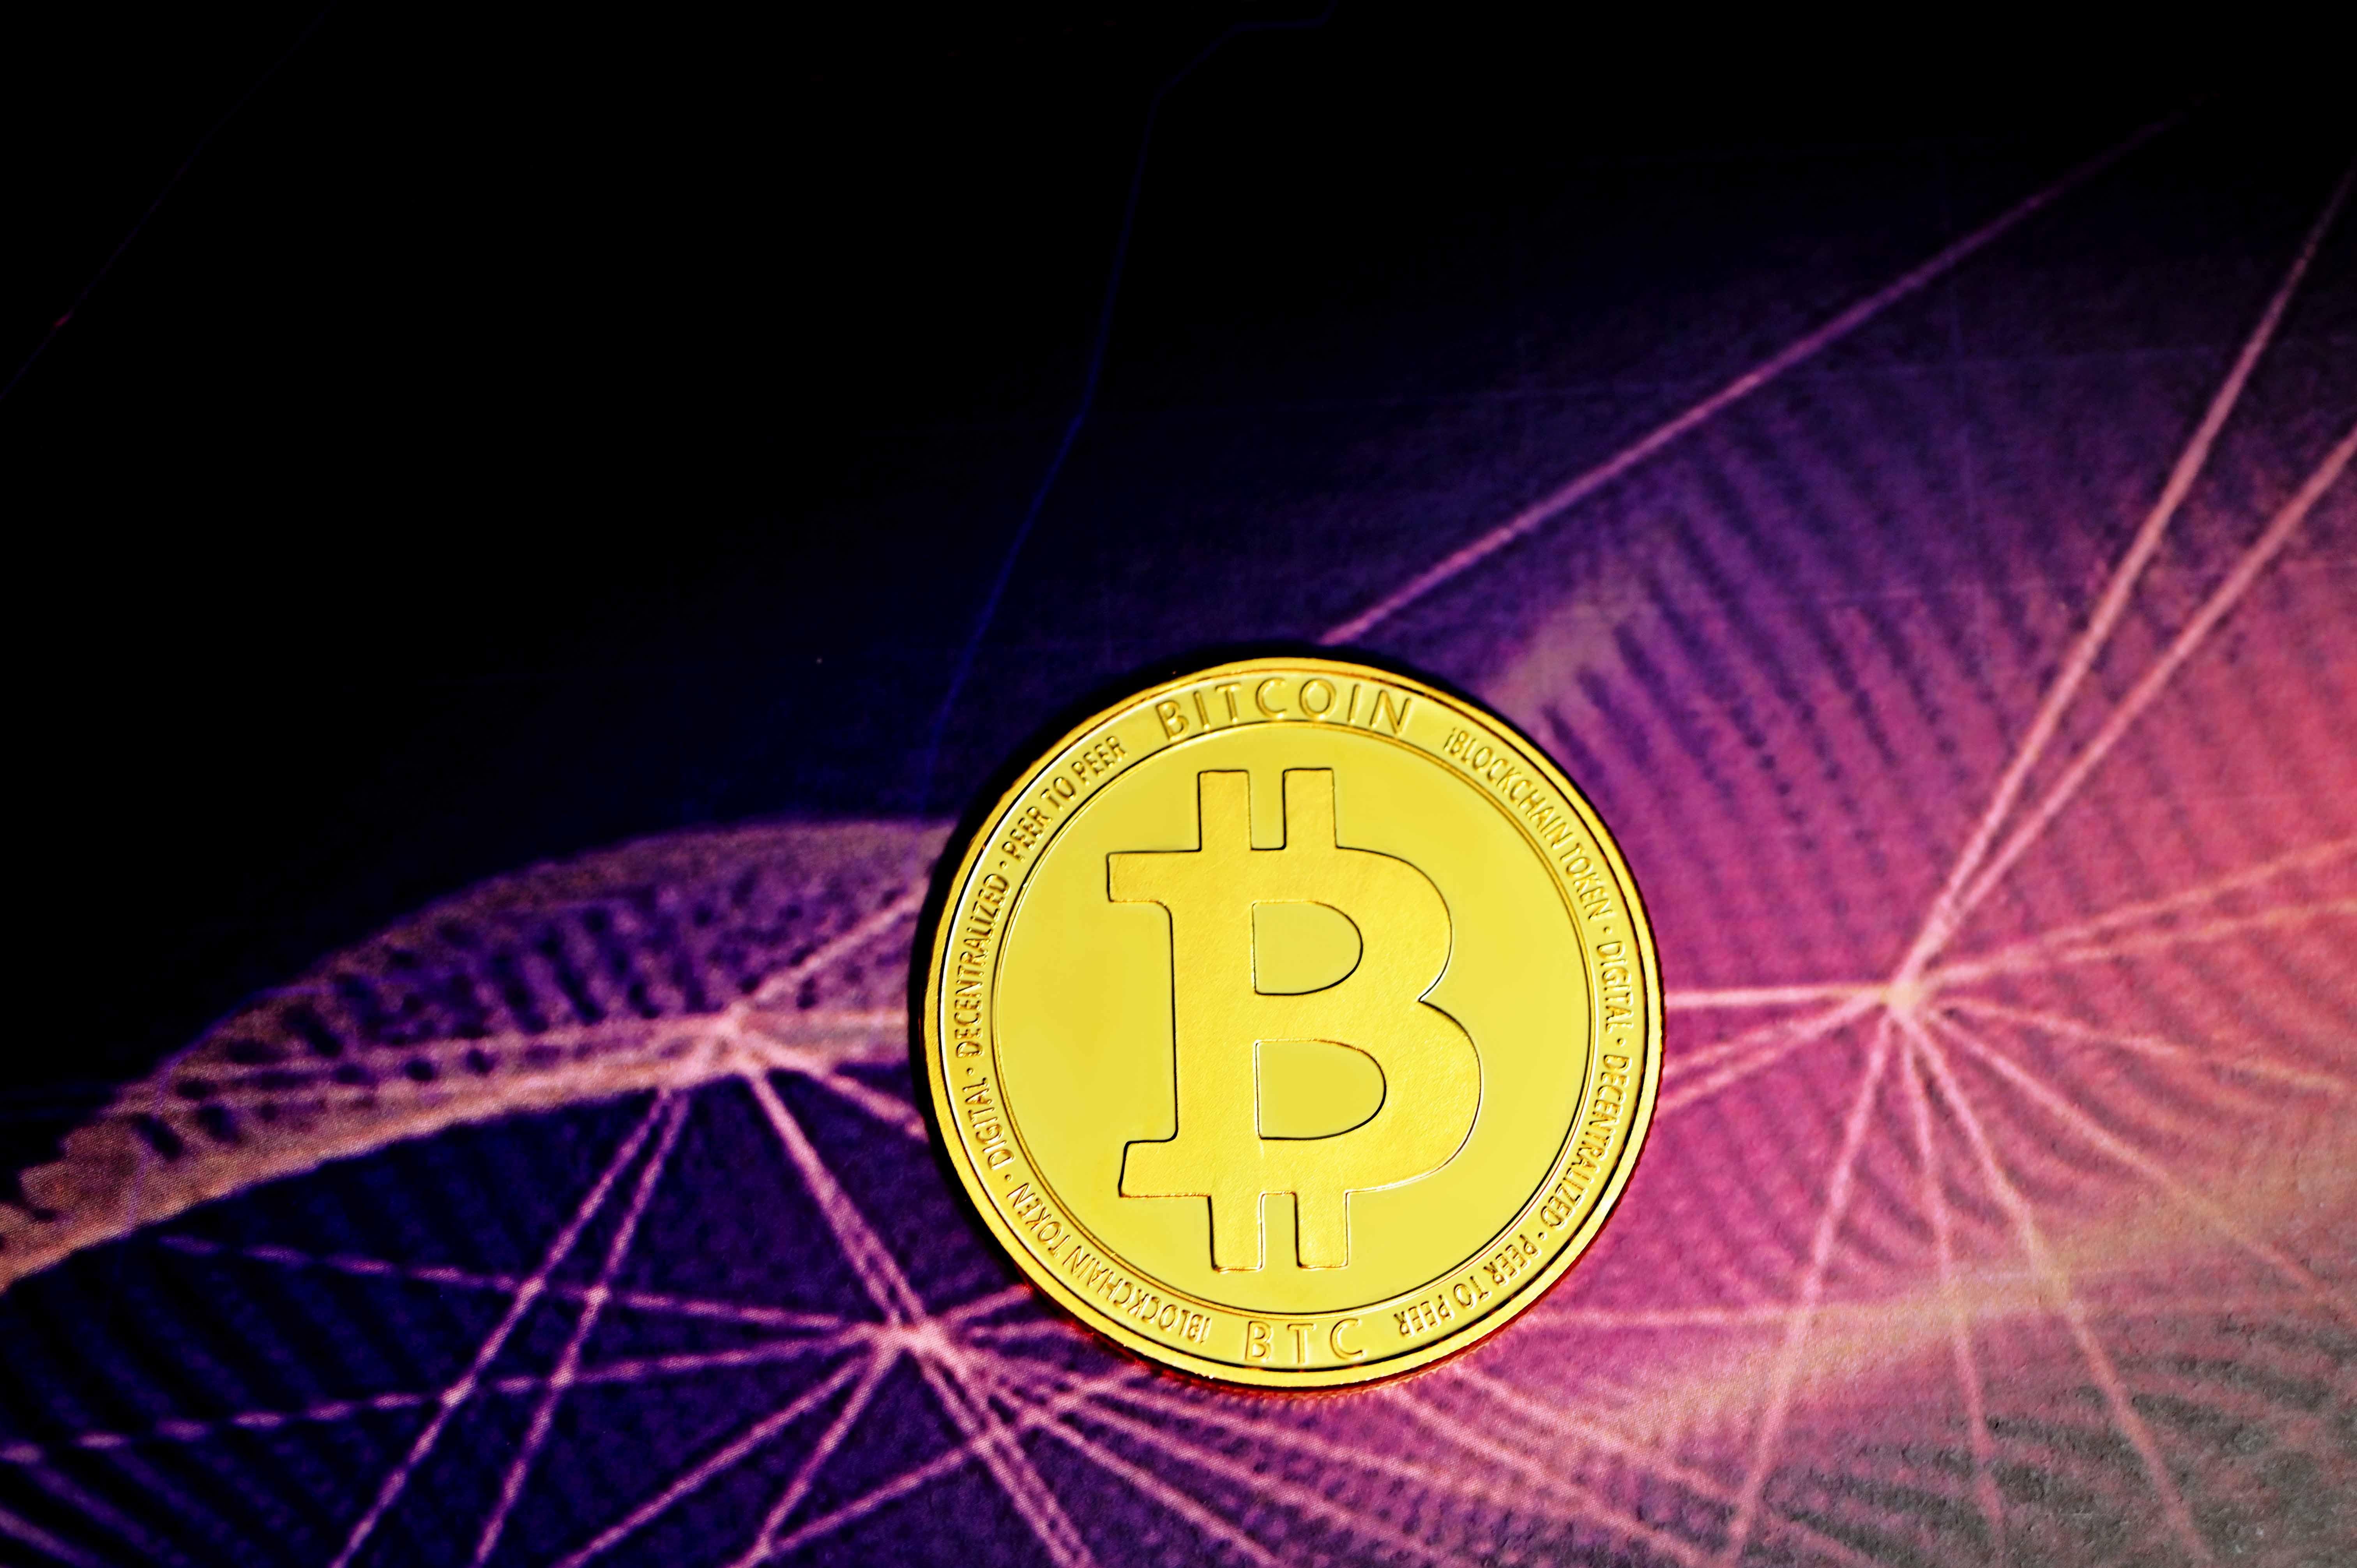 Return Of CME Futures Premium Hints At Q4 Bitcoin Bull Run